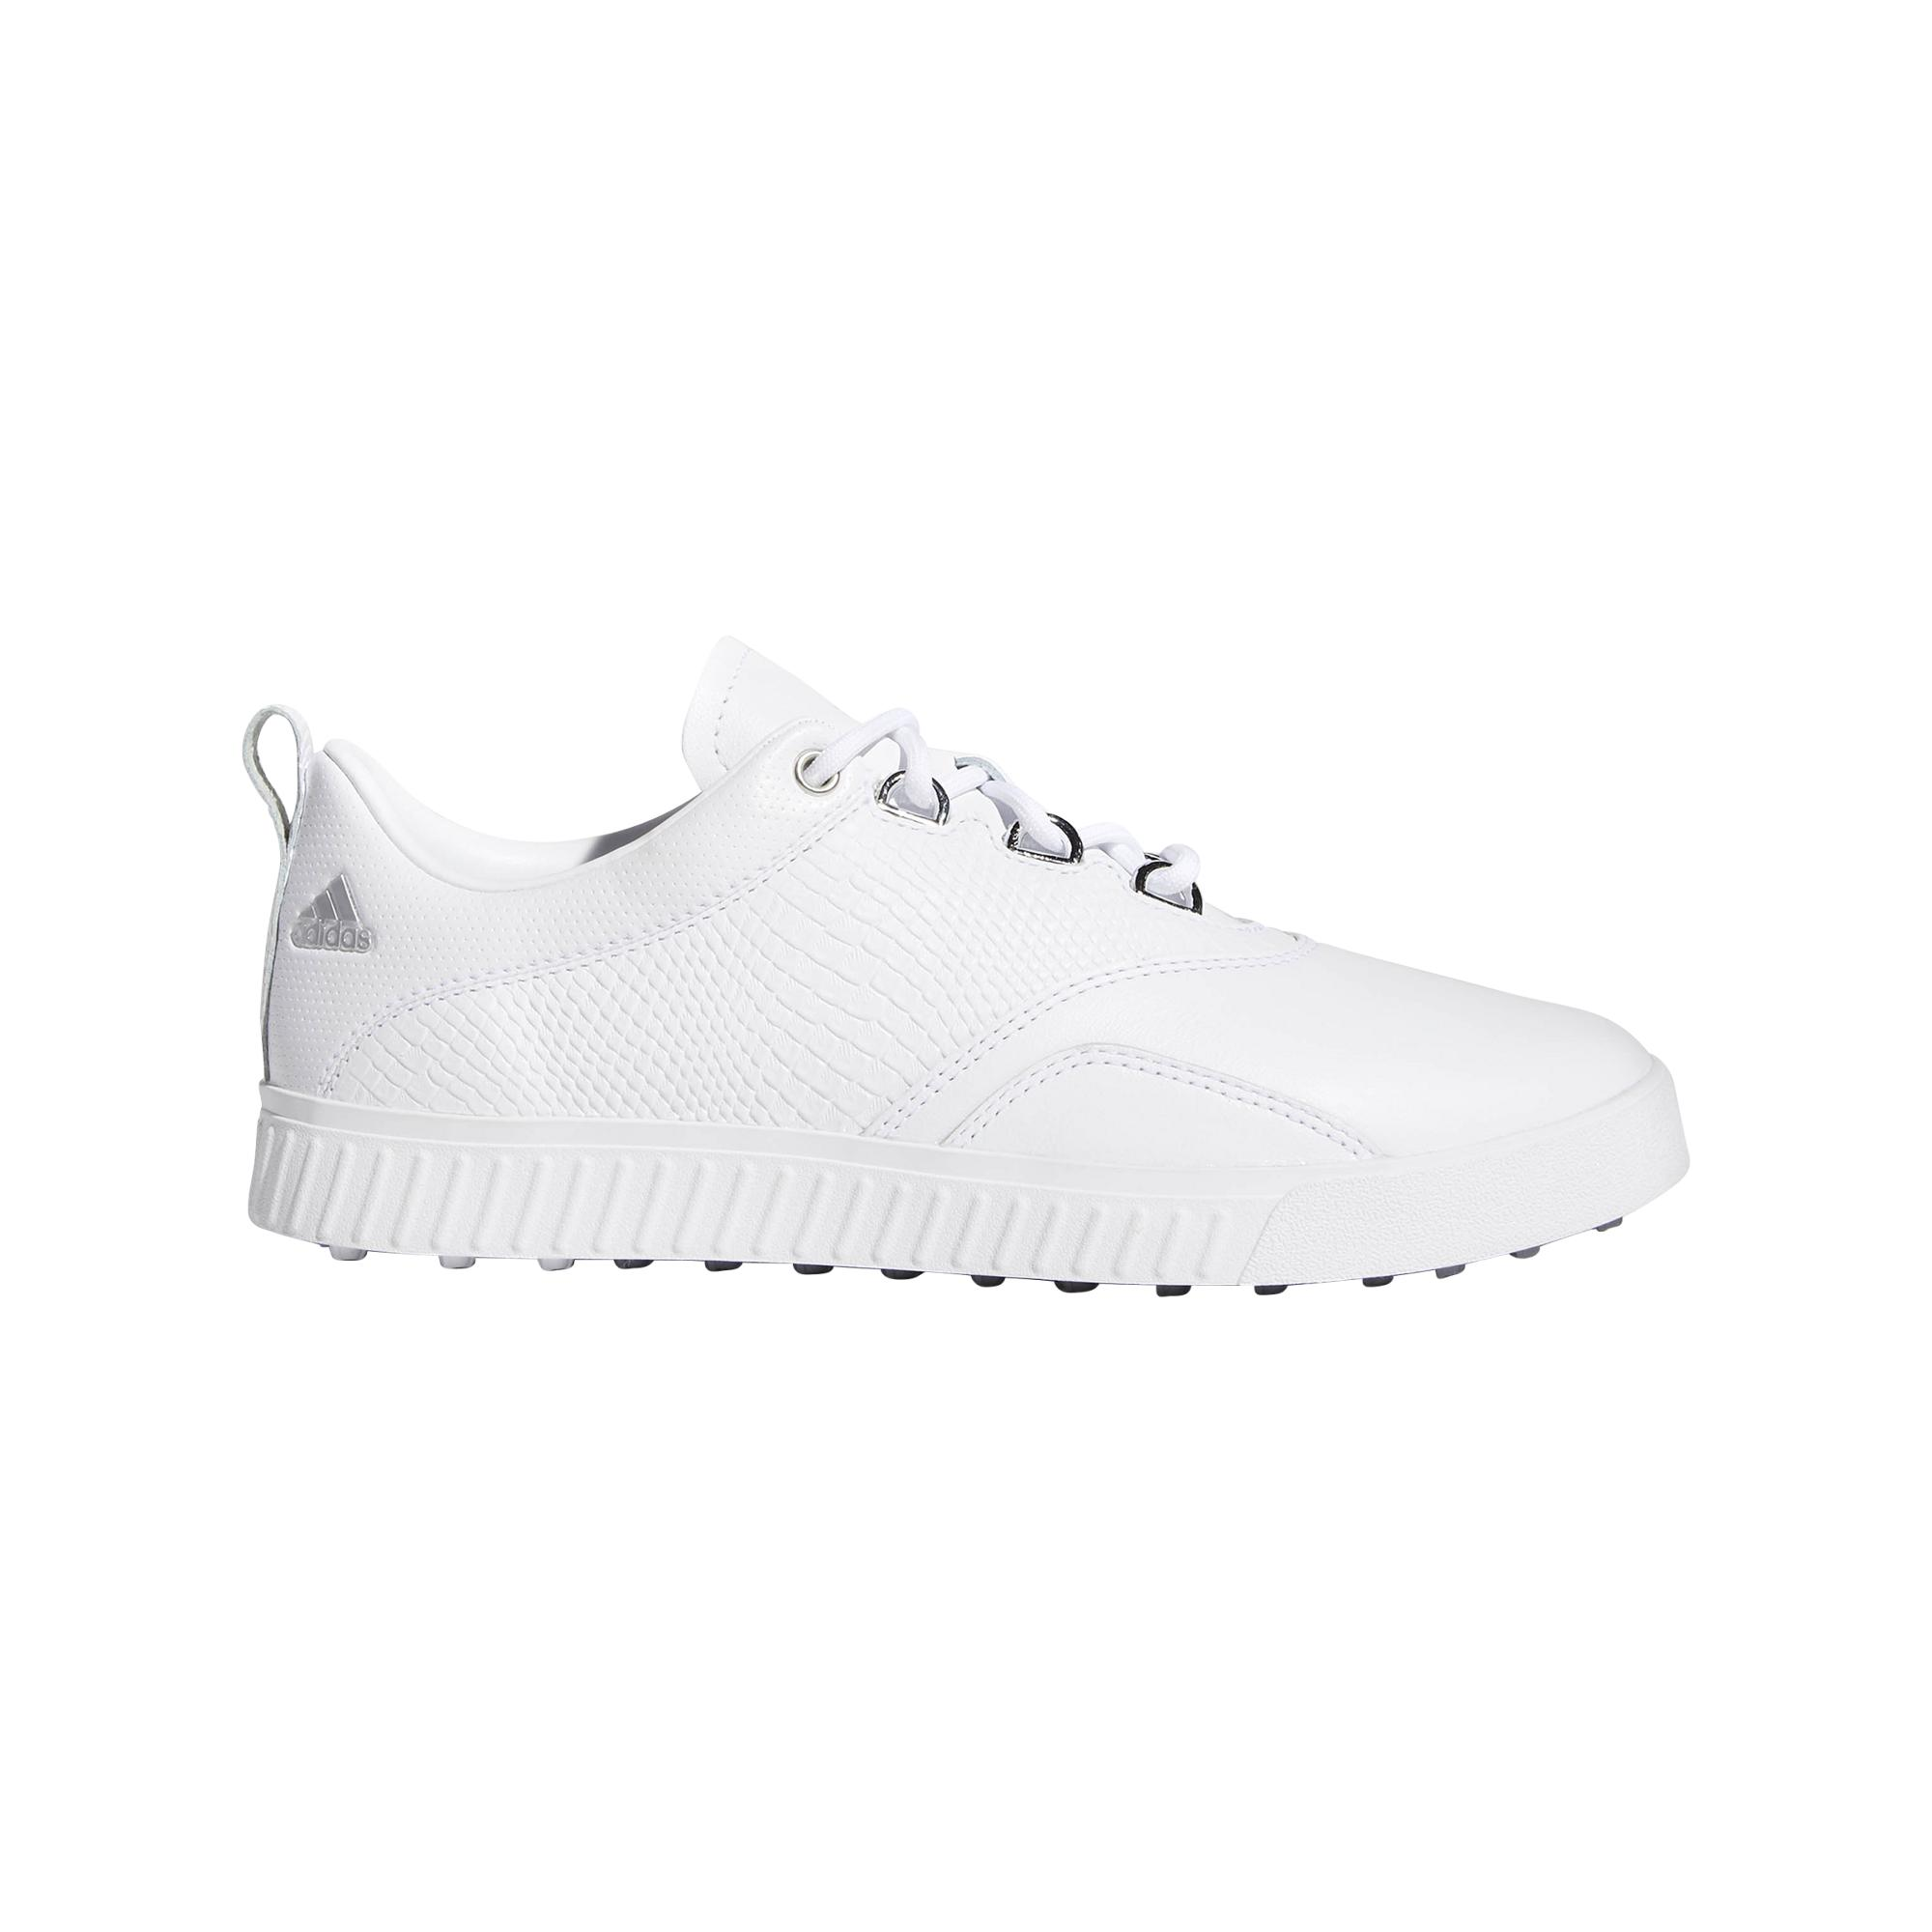 Chaussures Adicross PPF sans crampons pour femmes – Blanc